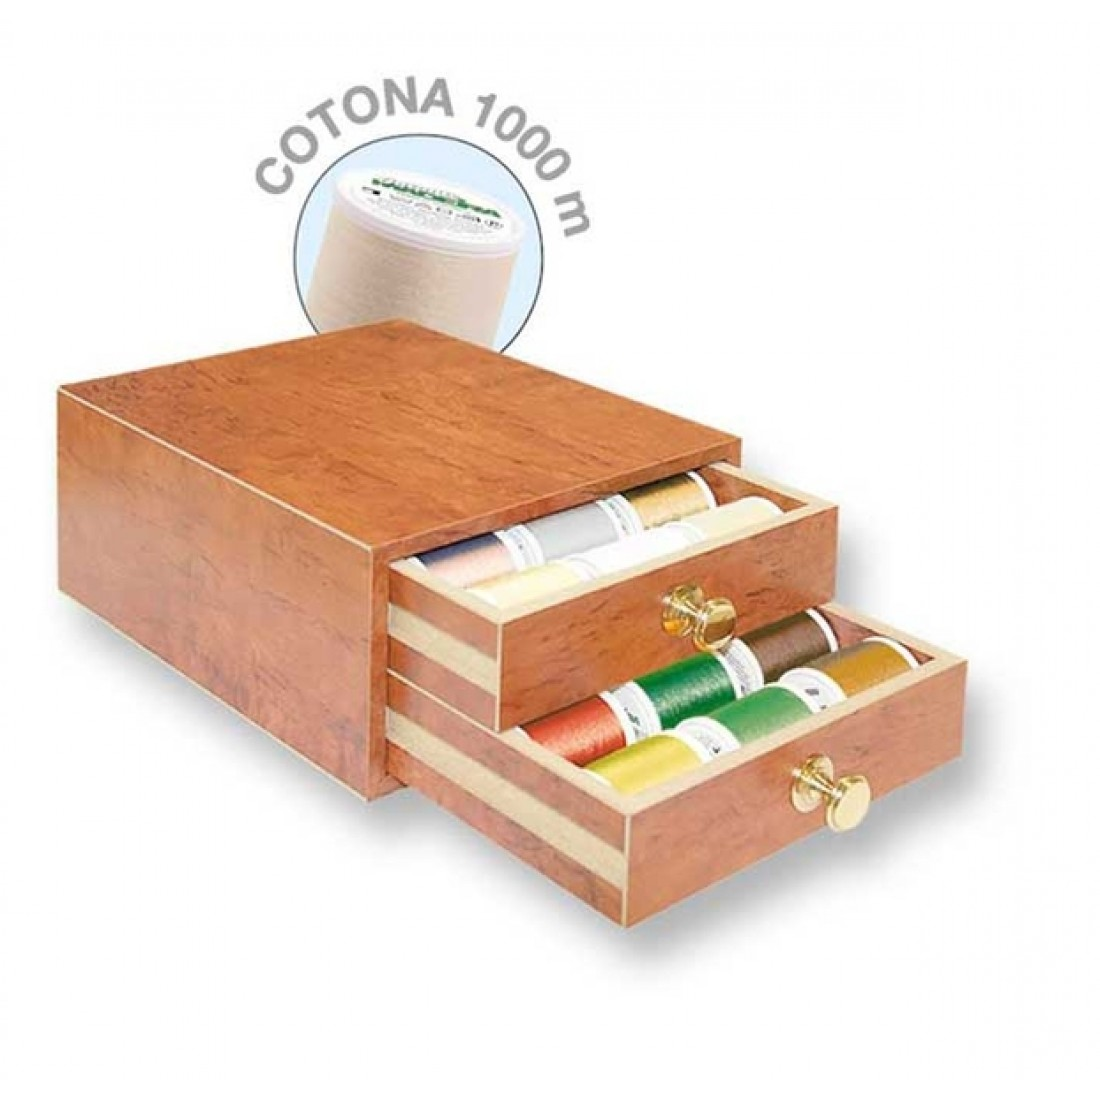 Набор Madeira Cotona №50 в шкатулке (30х1000 м) арт. 8117